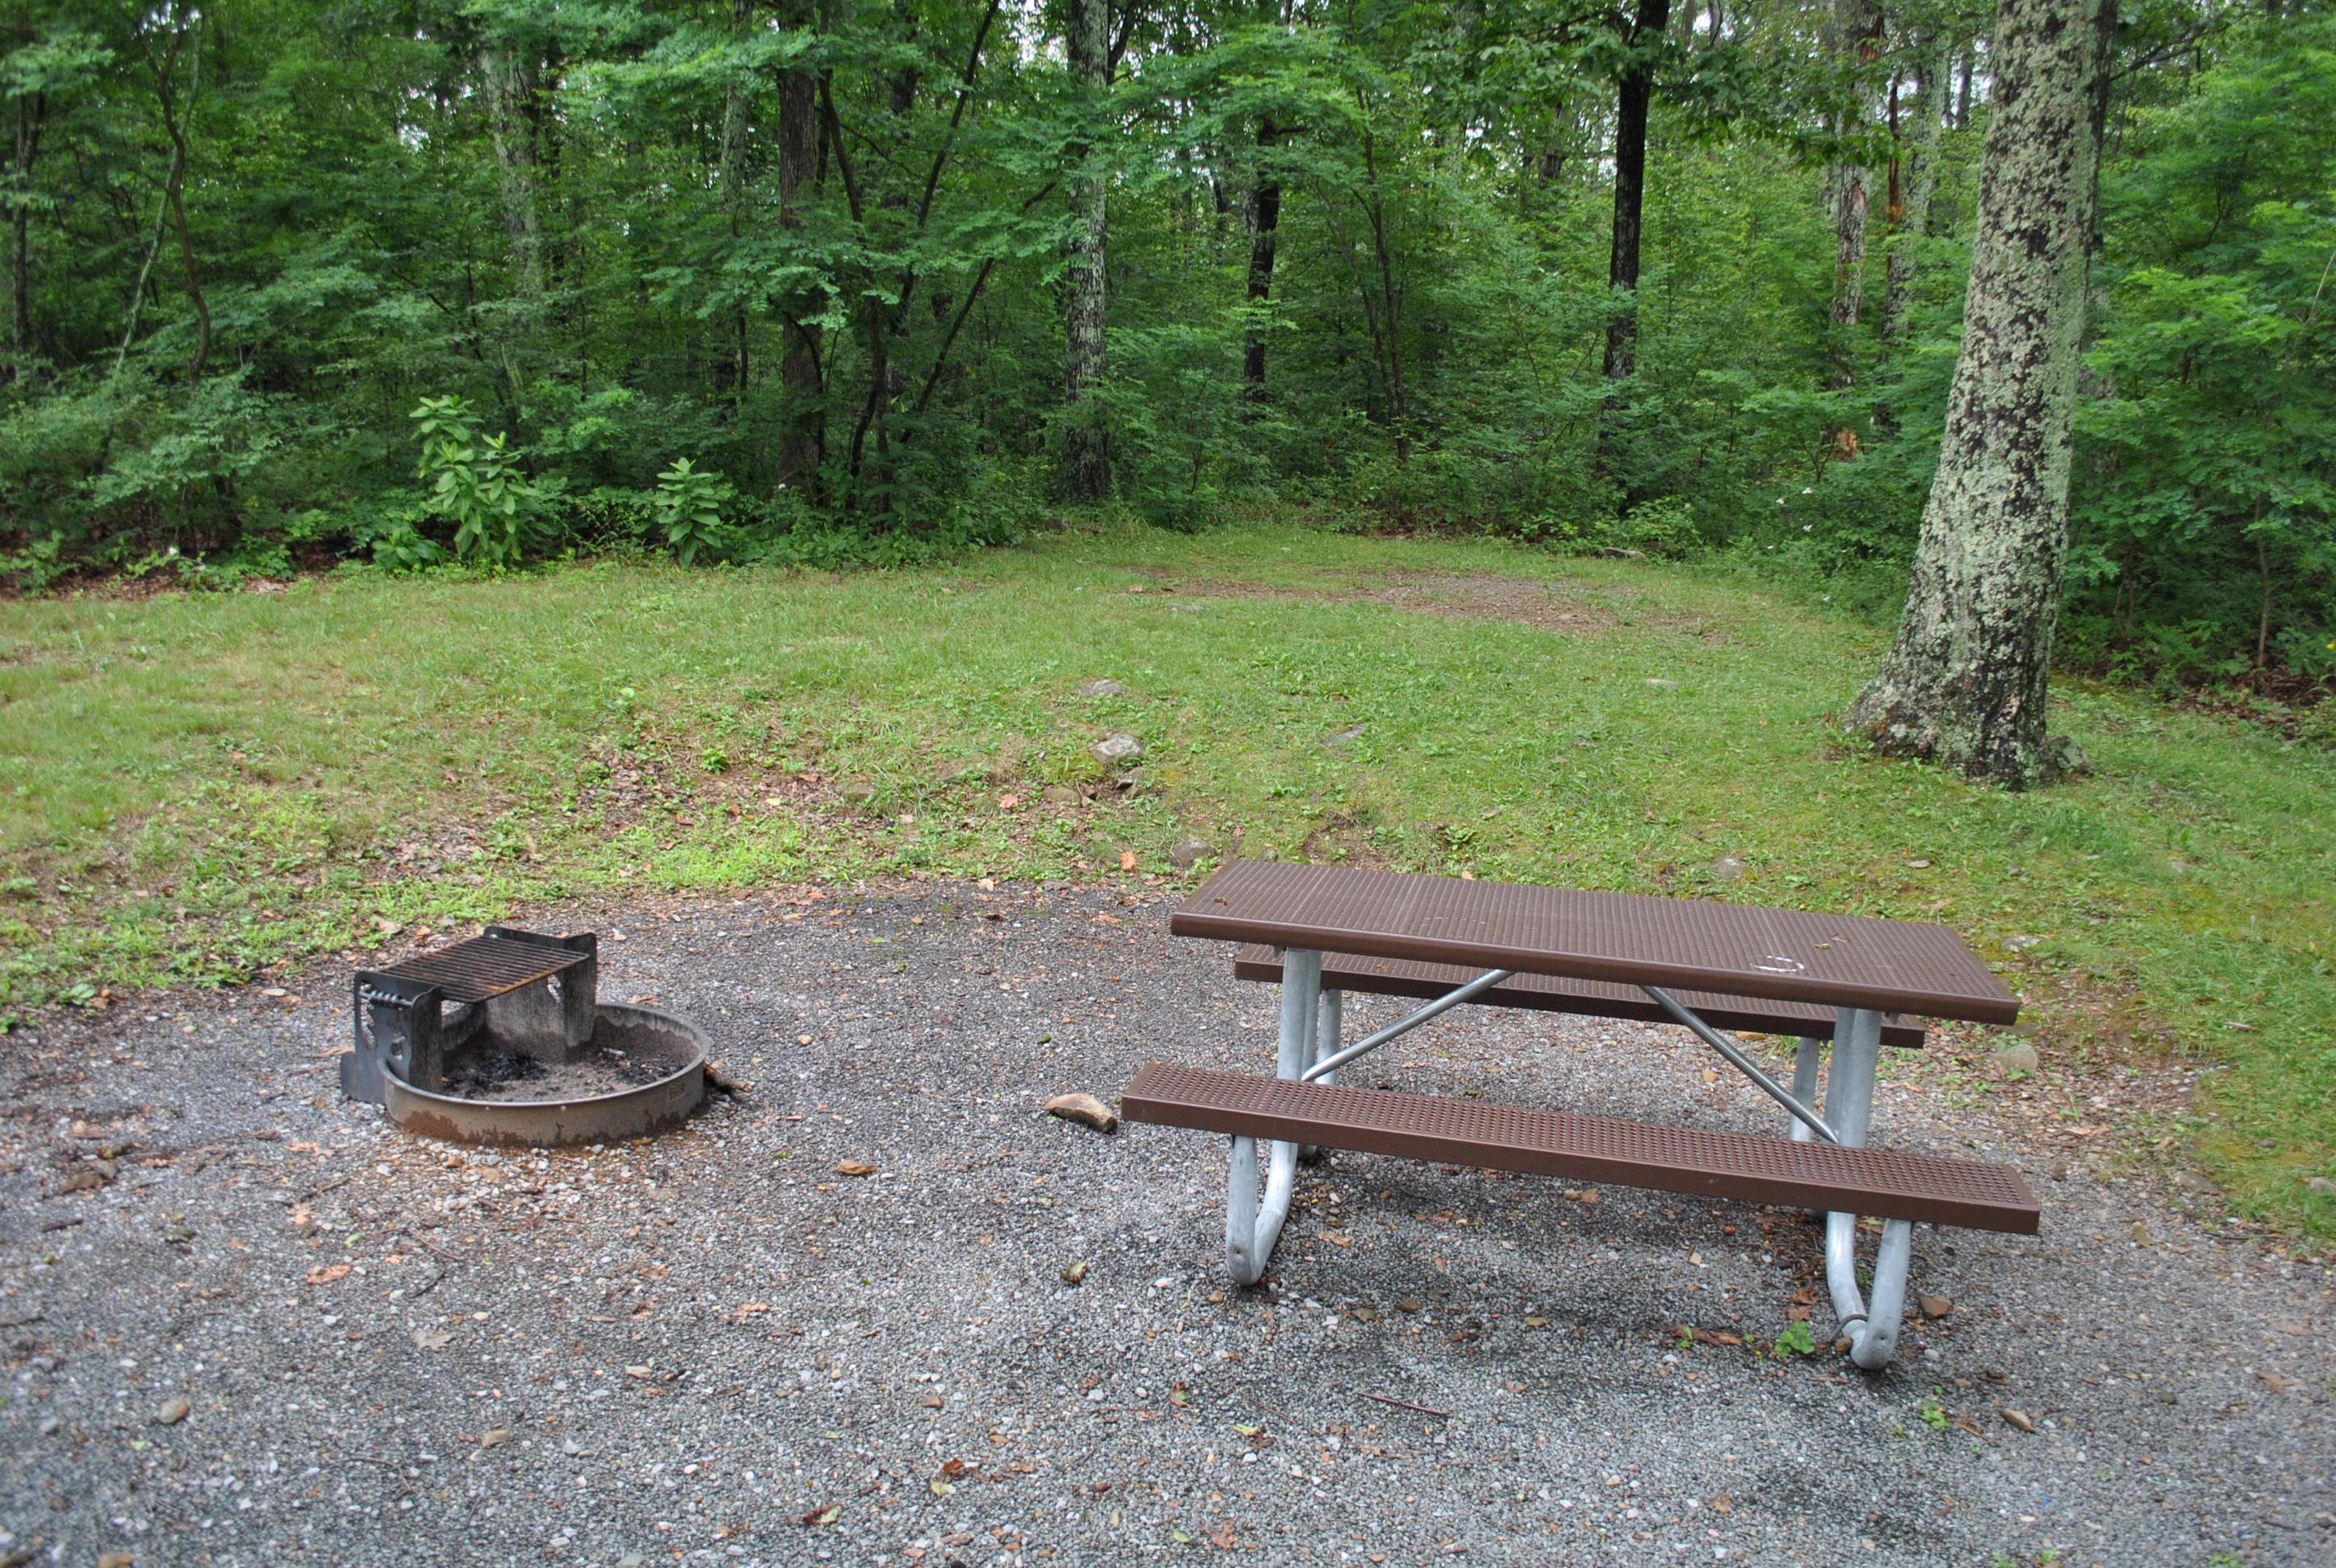 Mathews Arm Campground – Site A045